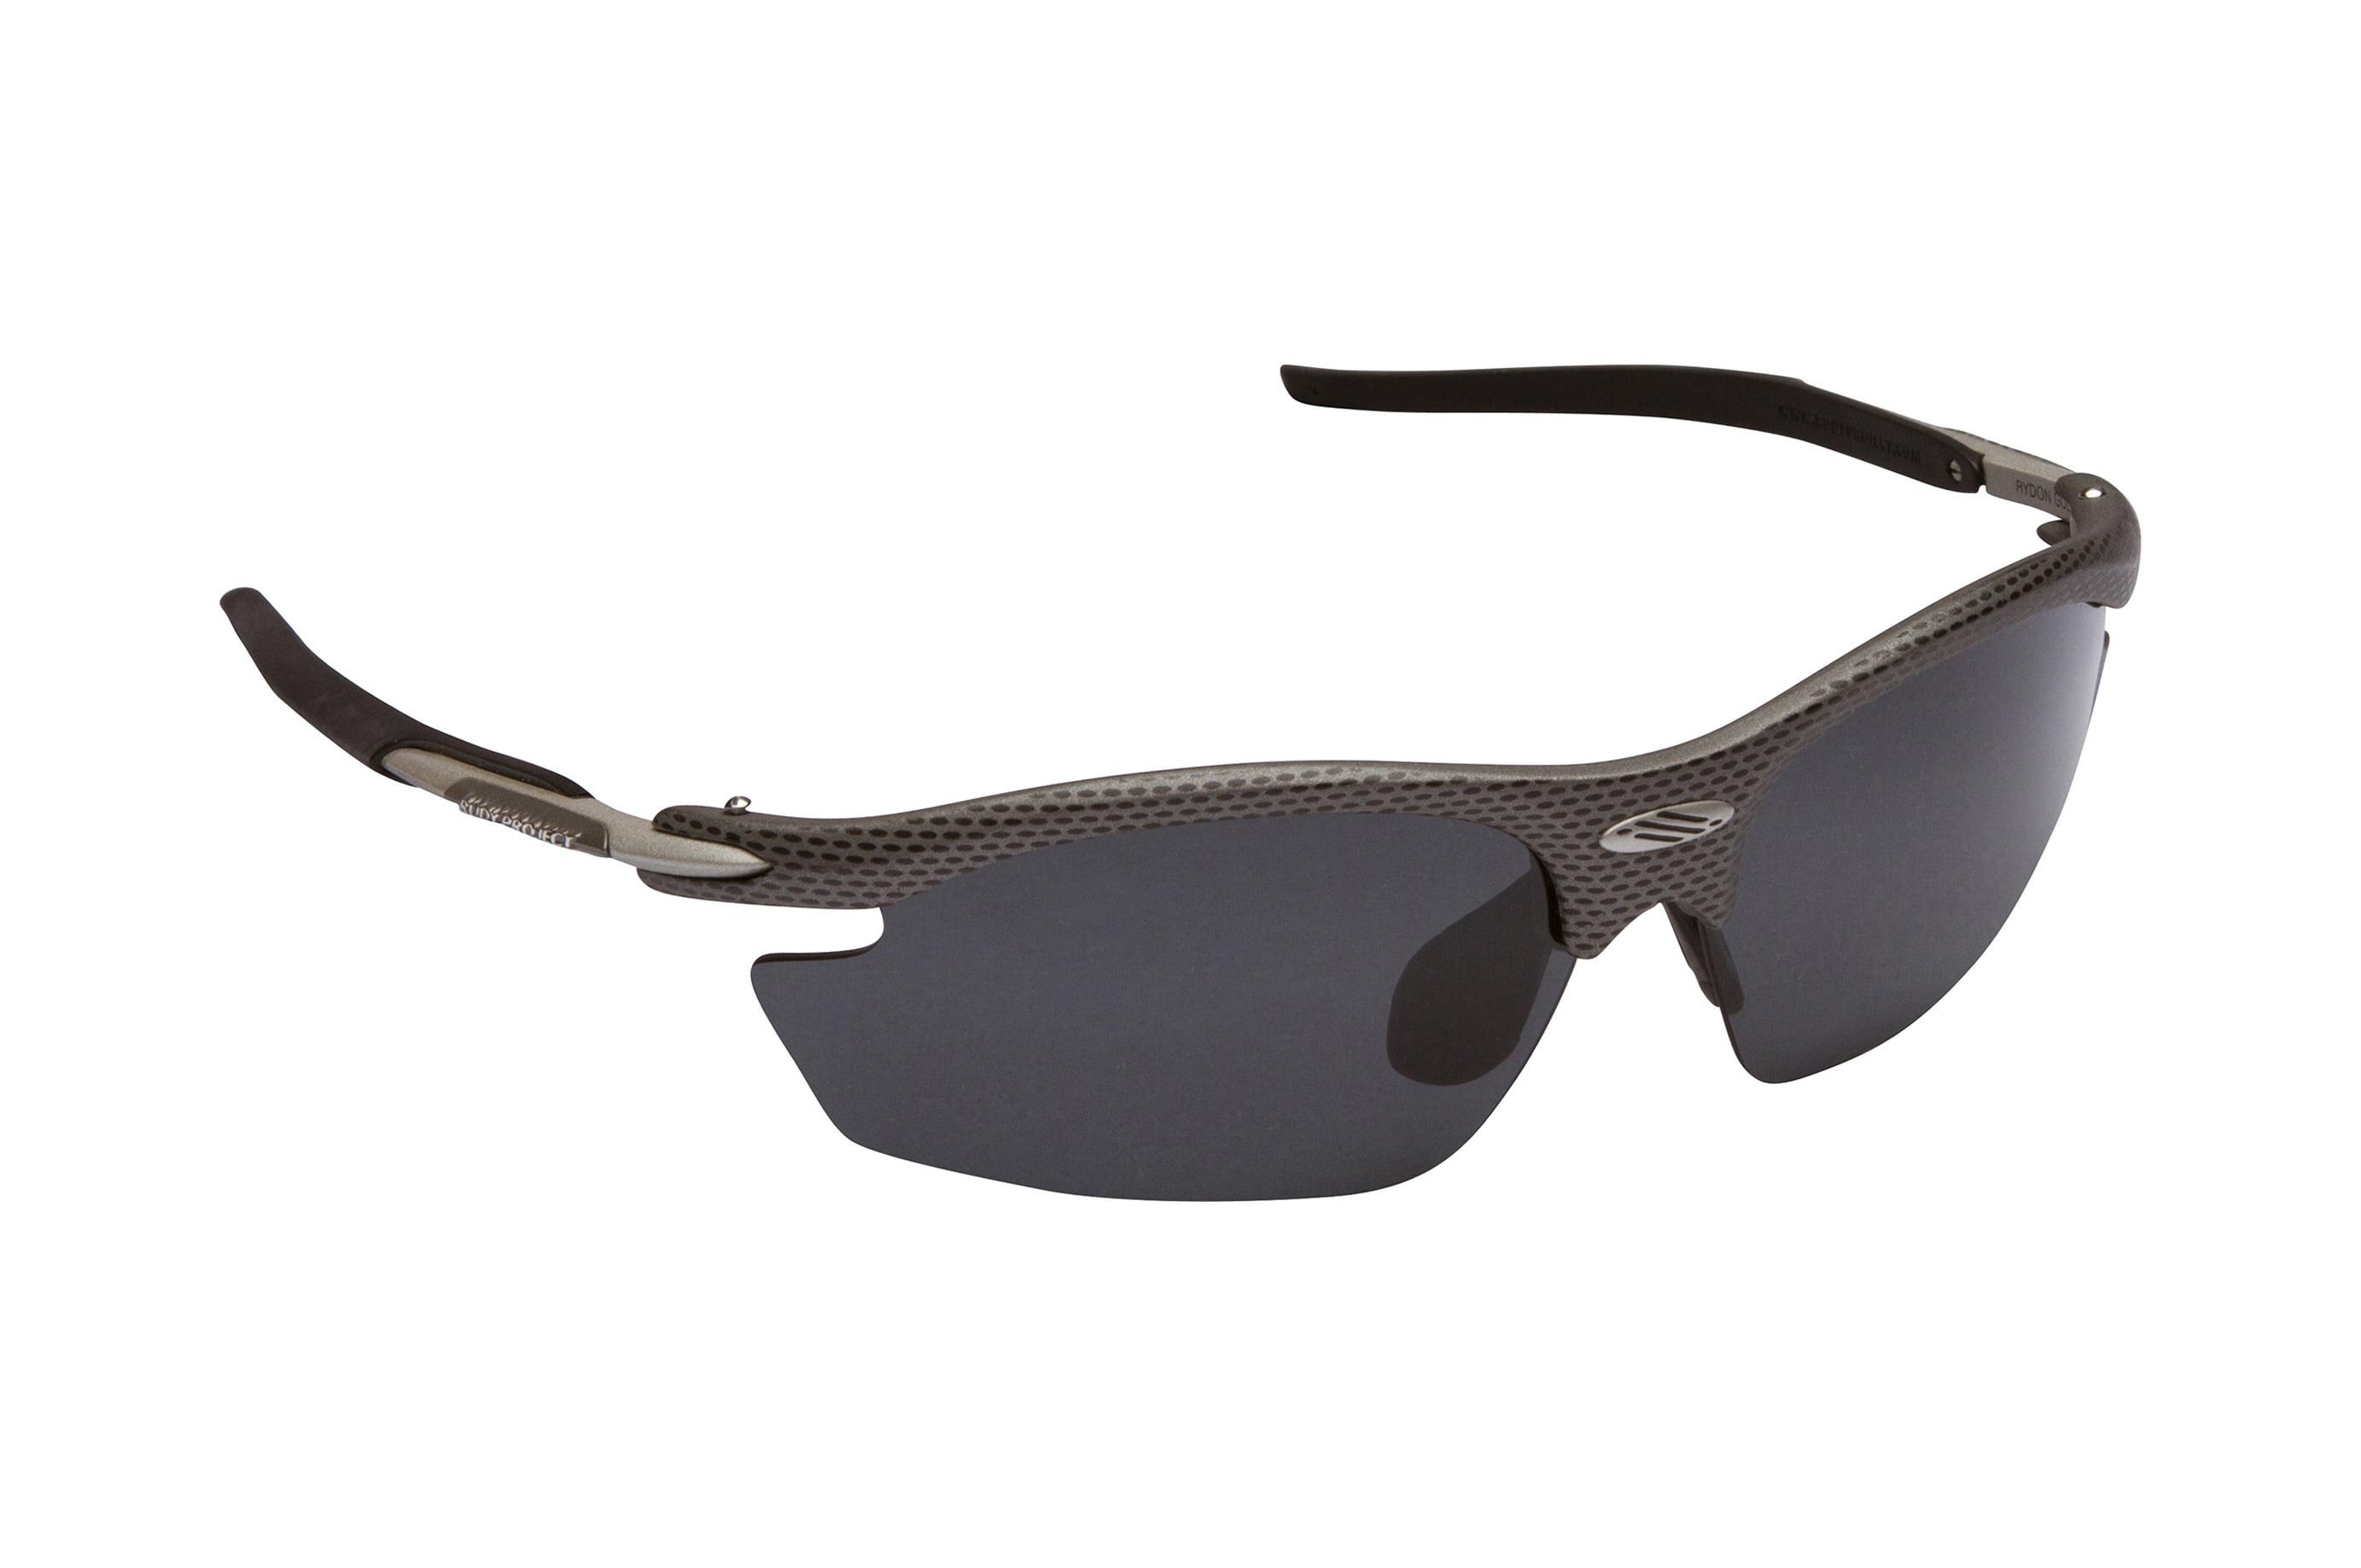 d4f5869444 Seek Optics - Rydon Replacement Lenses Polarized Black by SEEK fits RUDY  PROJECT Sunglasses - Walmart.com